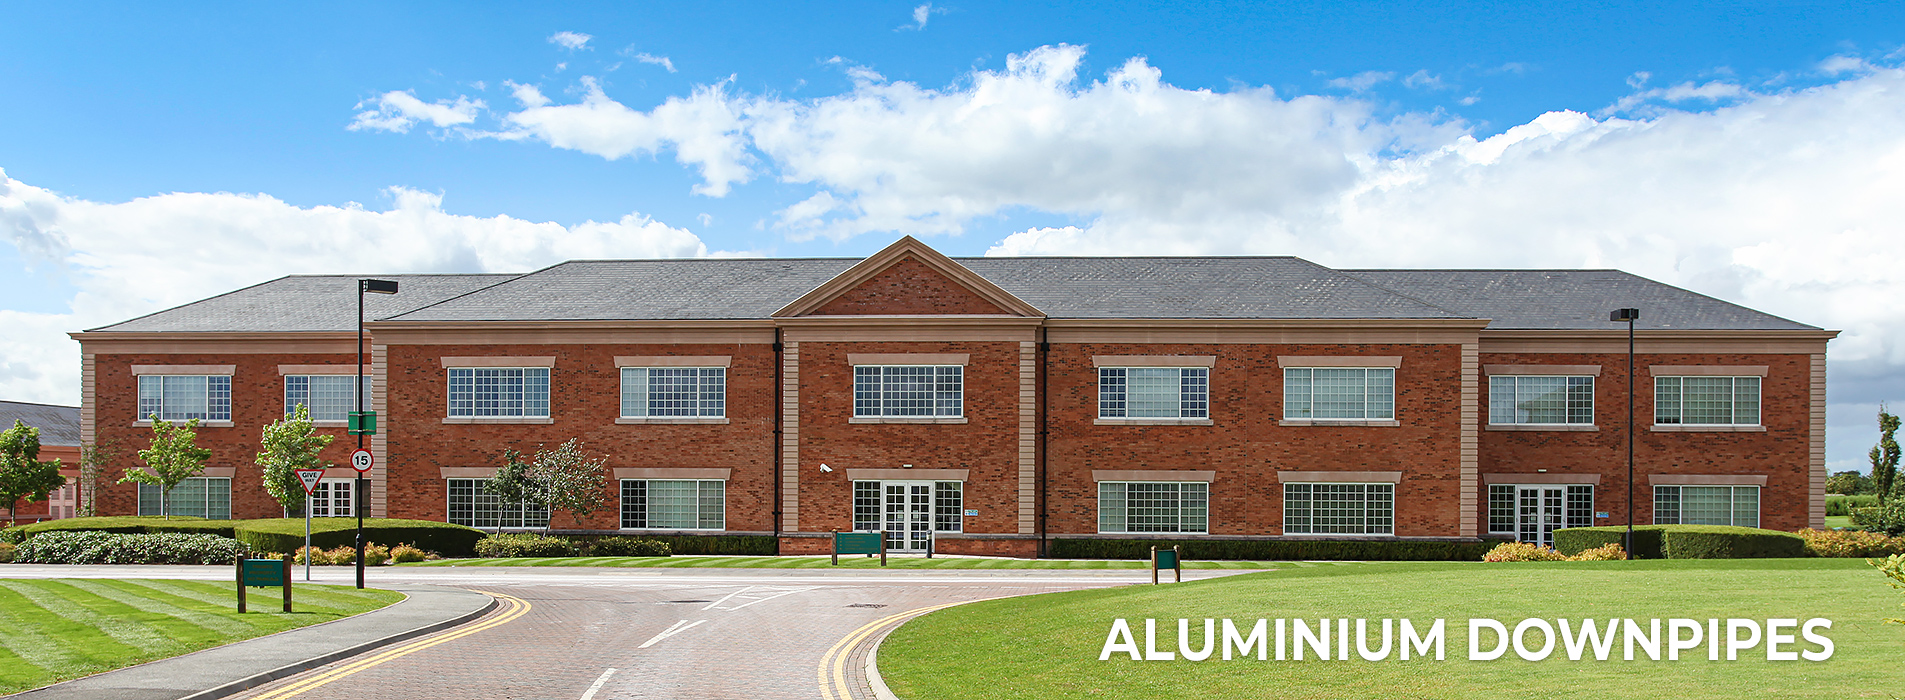 Aluminium Downpipes for Tewkesbury Care Home